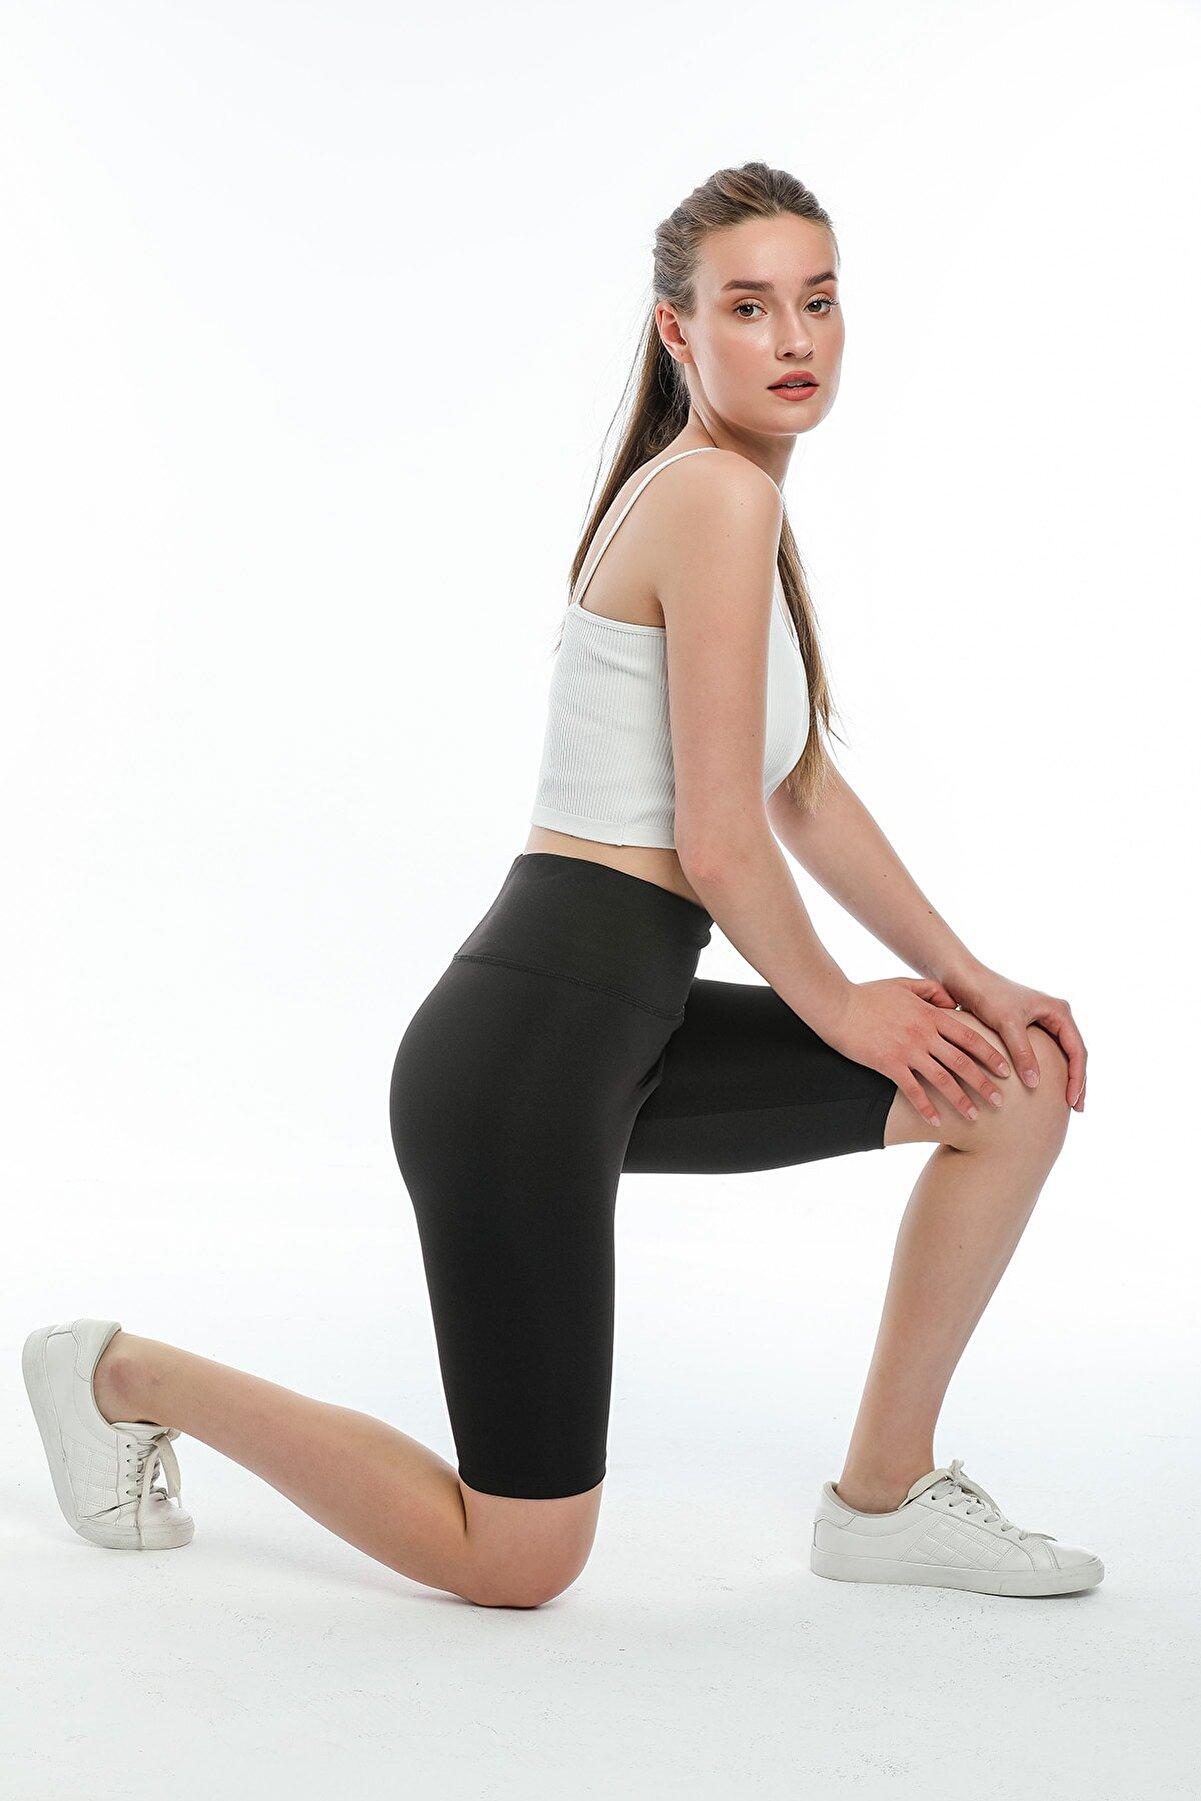 H&T TIGER Kadın Siyah Kısa Sporcu Tayt